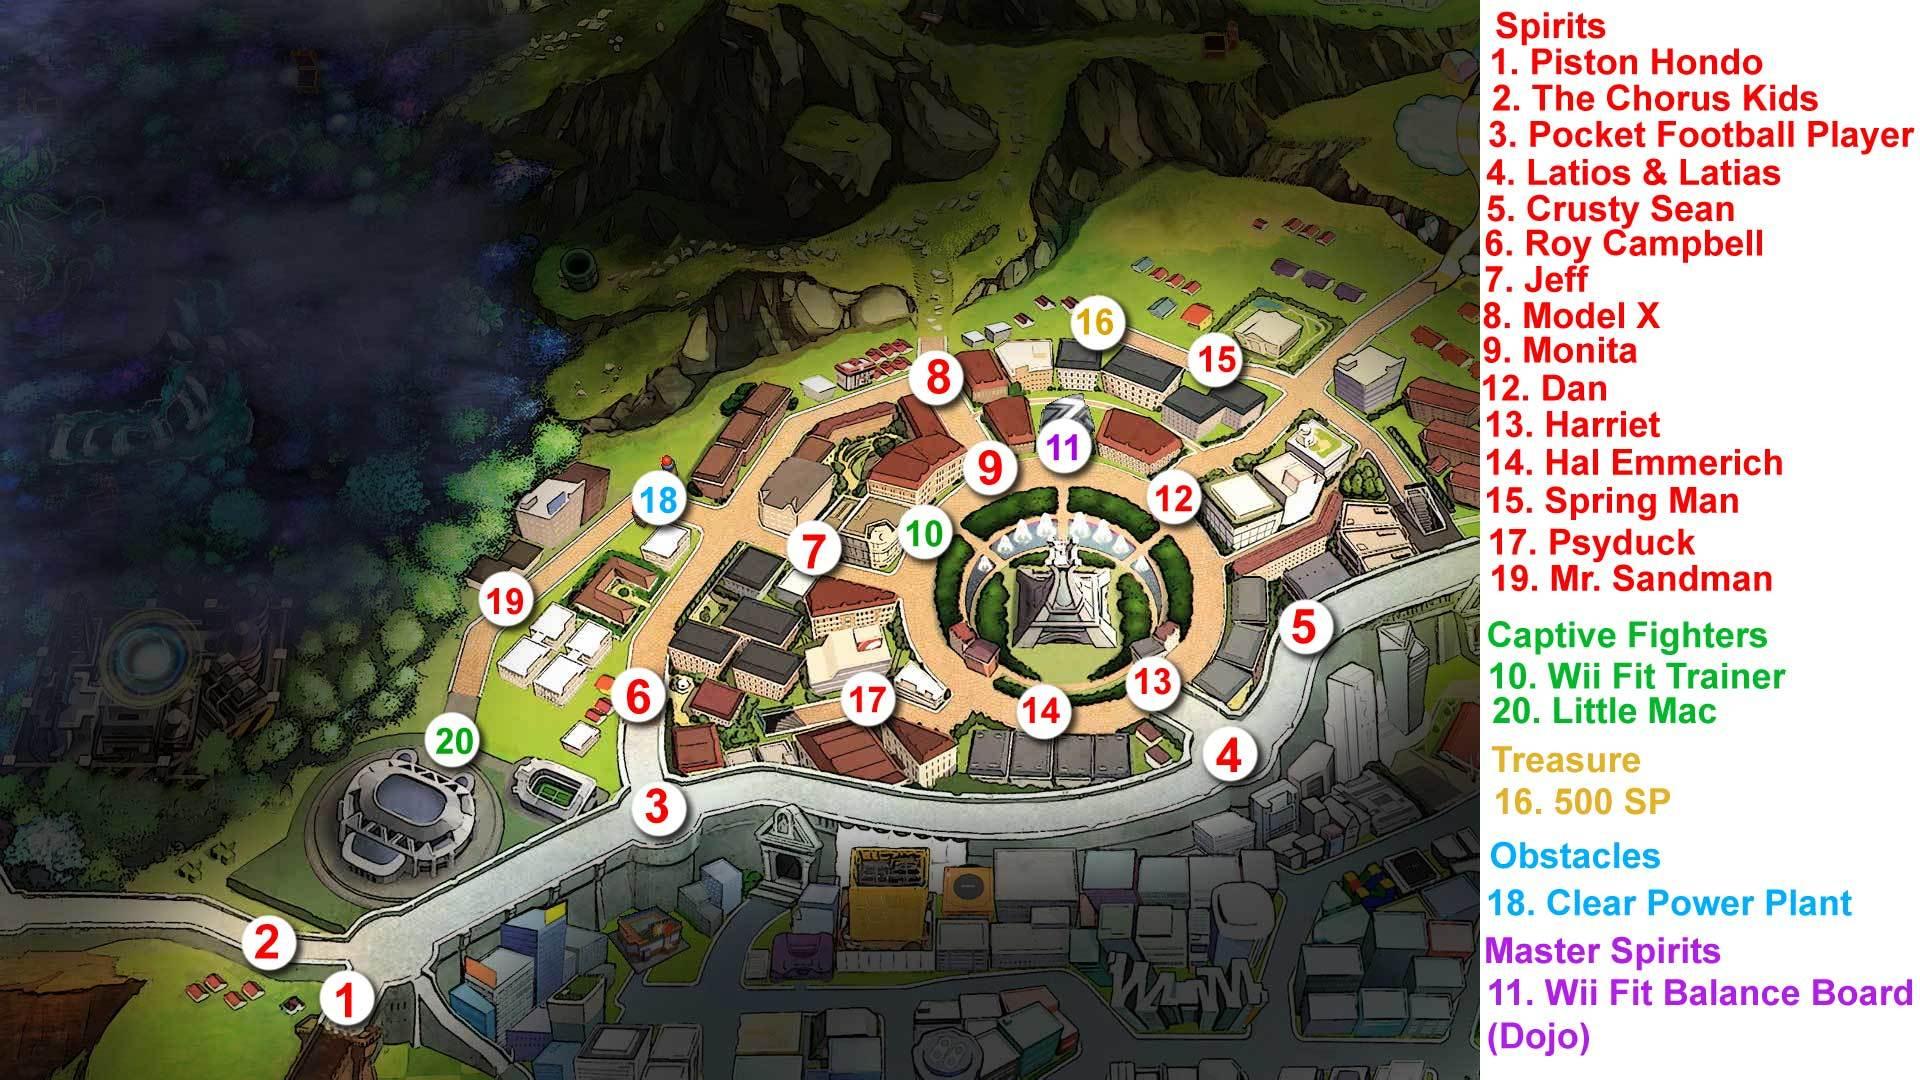 Lumiose City Super Smash Bros Ultimate Wiki Guide IGN